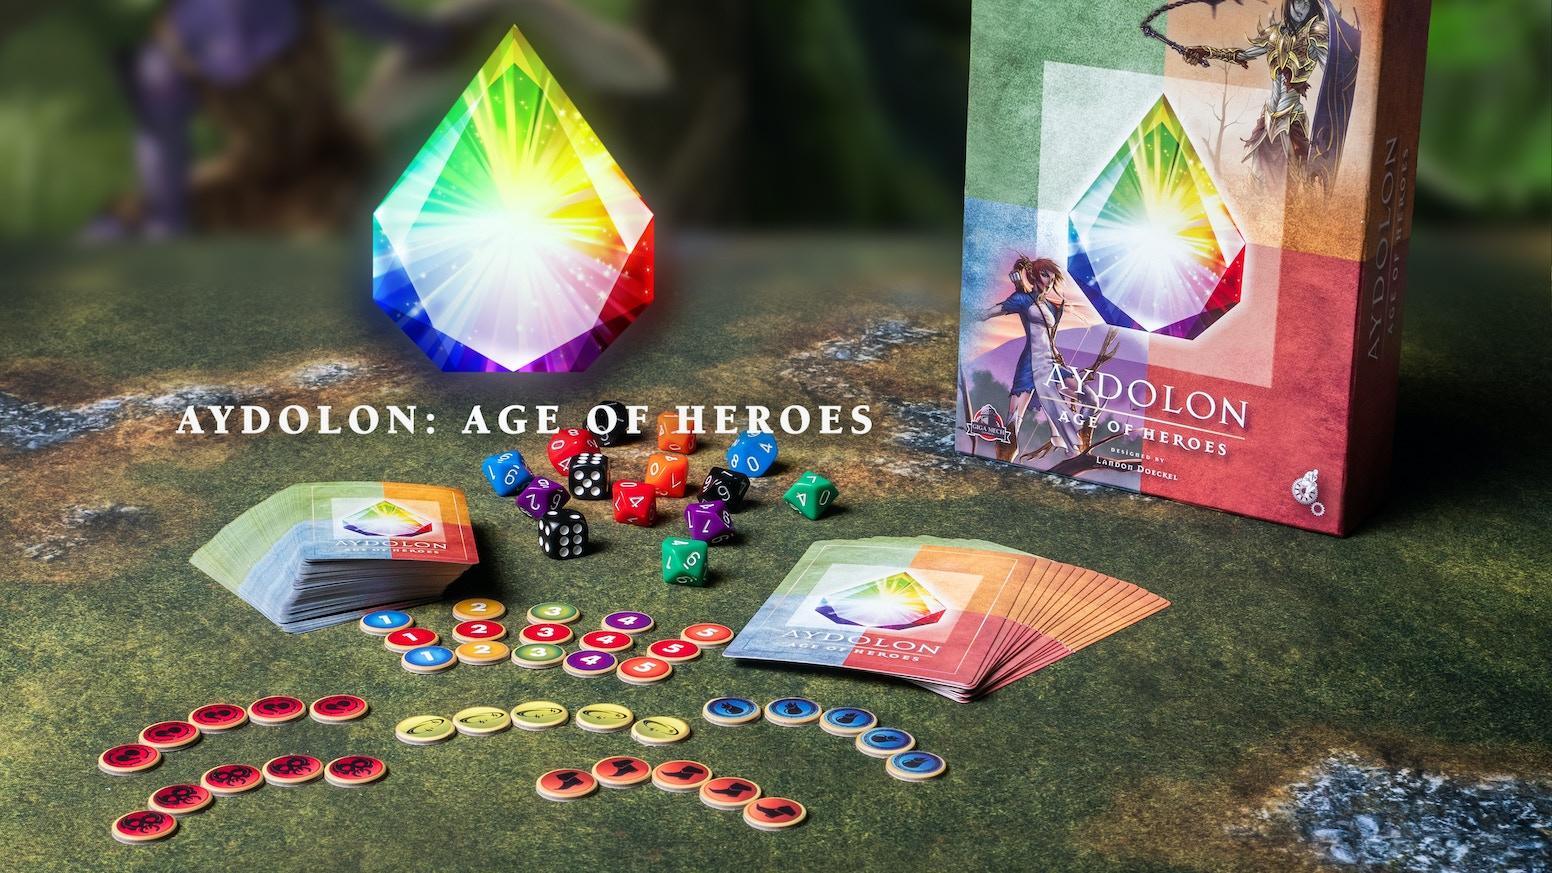 Aydolon: Age of Heros